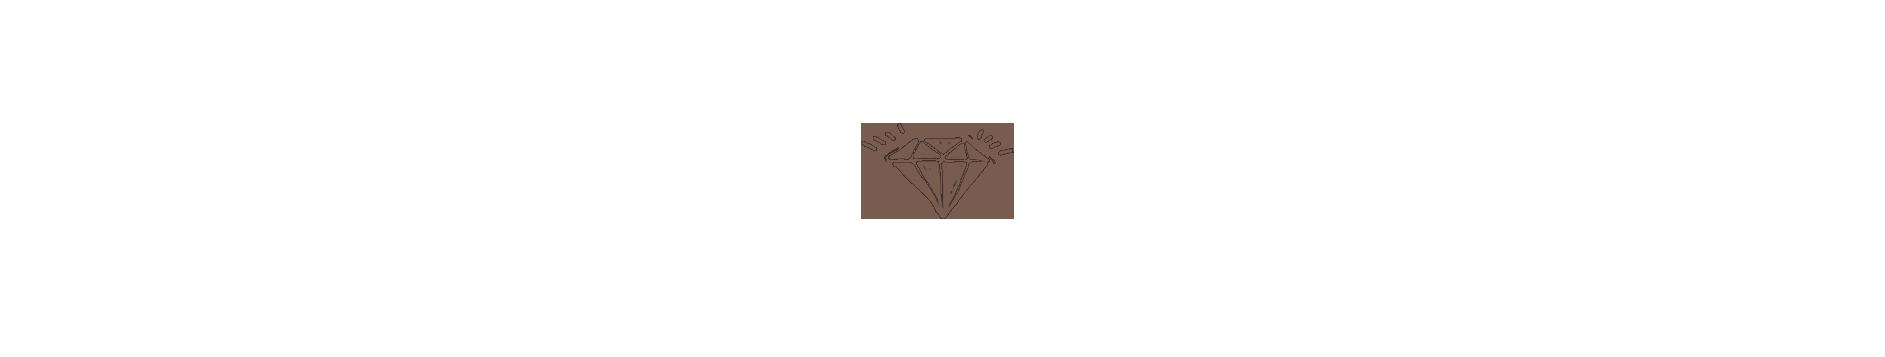 diamantenegro.png